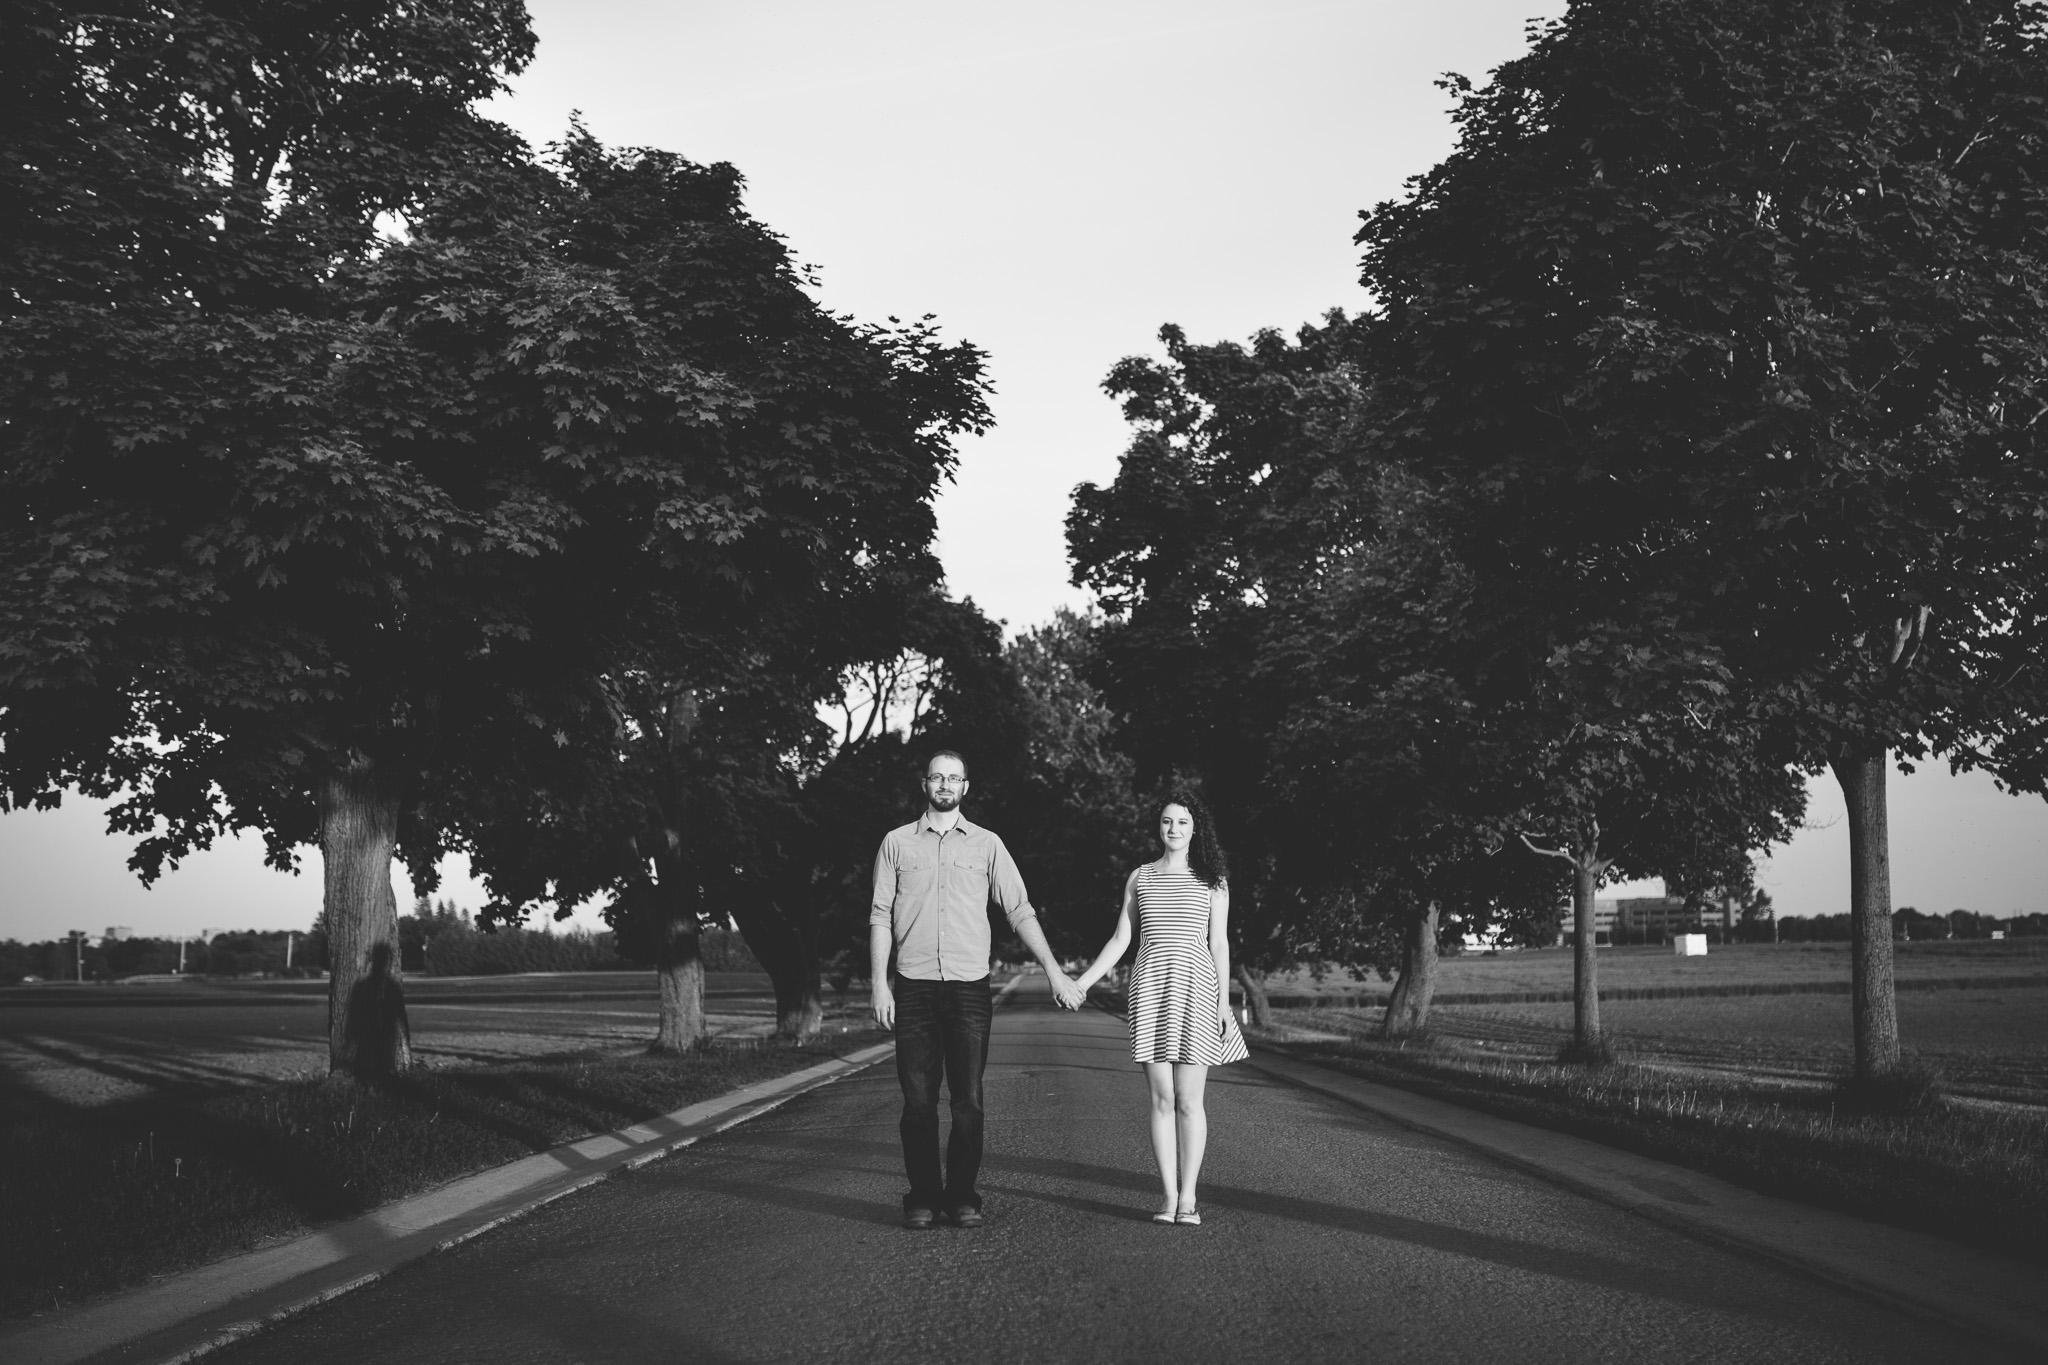 120-Jonathan-Kuhn-Photography-Amanda-Kevin-Engagement-WEB-0808.jpg